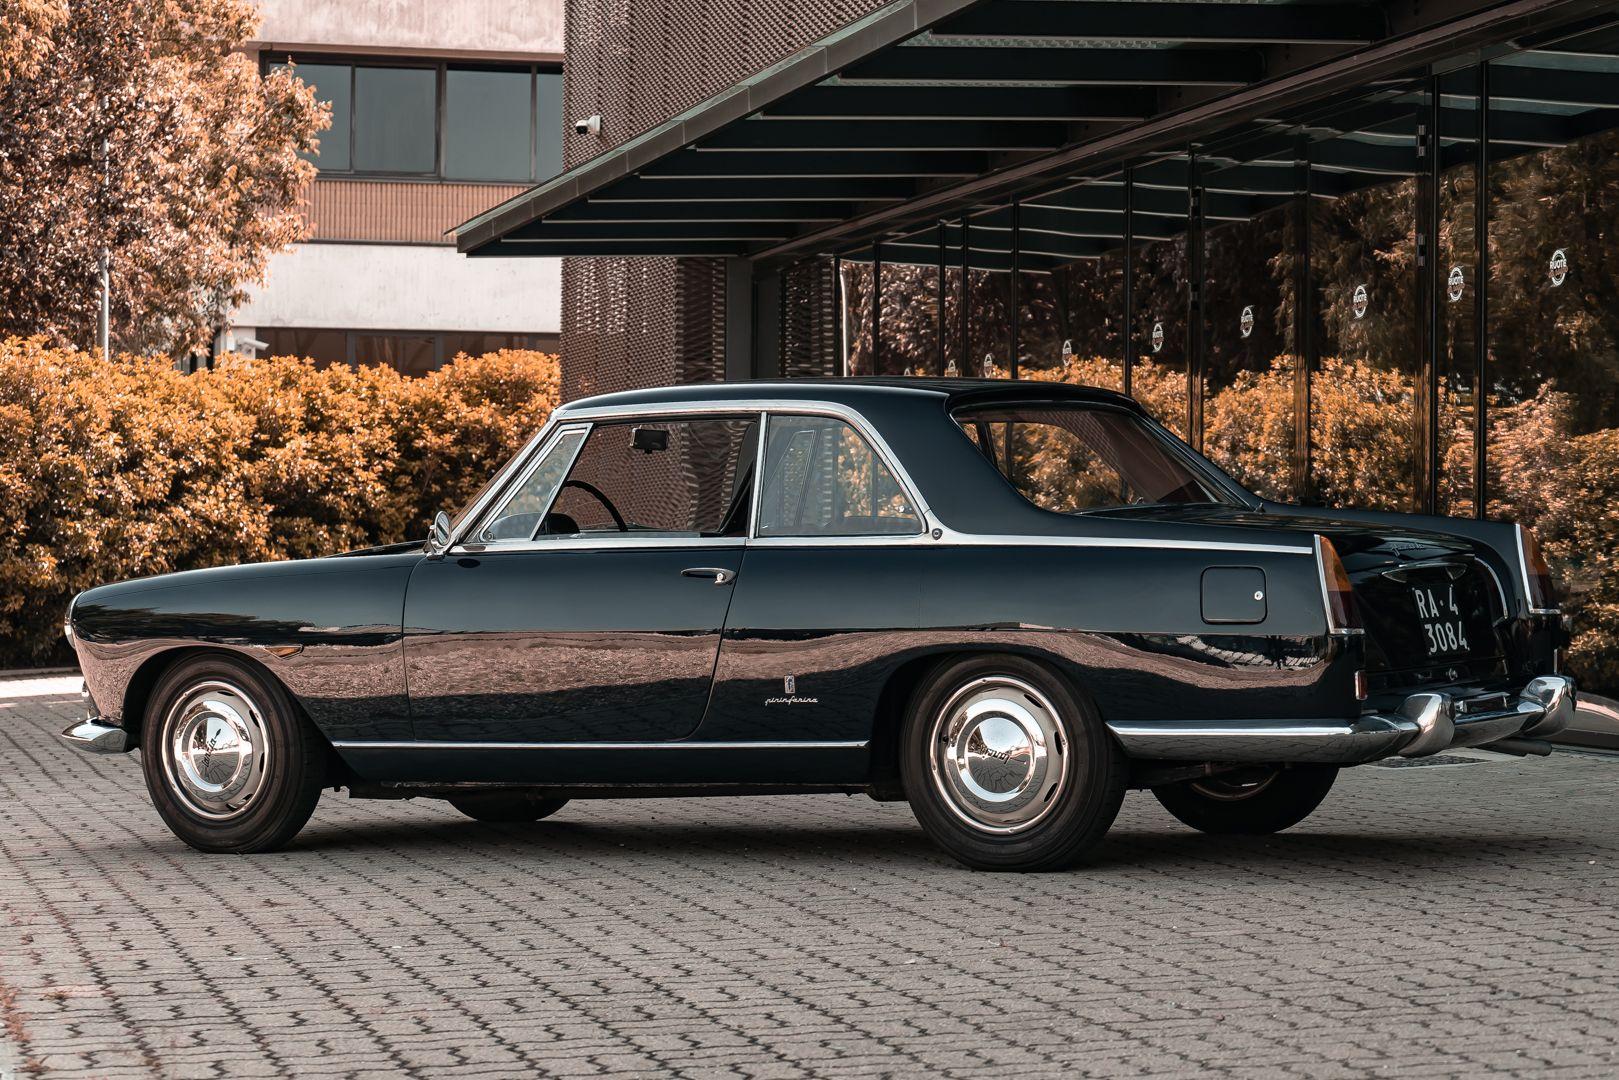 1960 Lancia Flaminia Coupé Pininfarina 2.5 76023